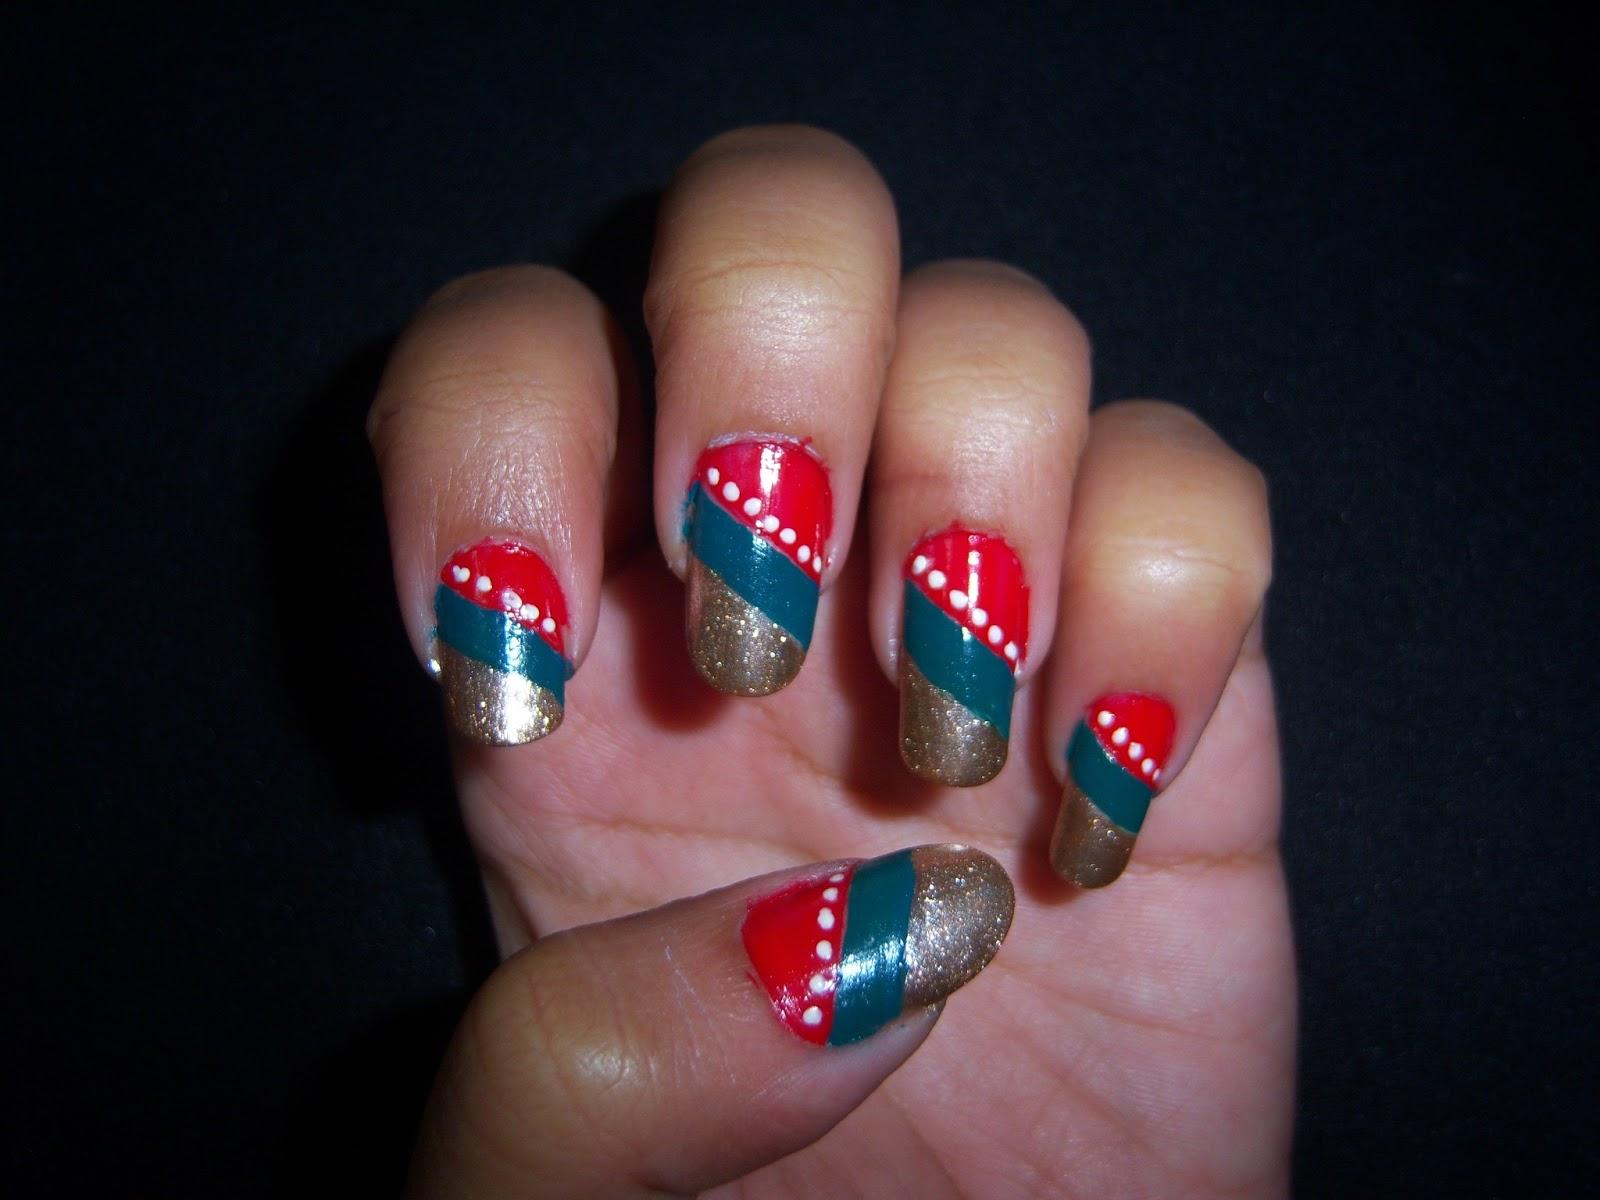 Saipriya Patel: Traditional Nail Art Design